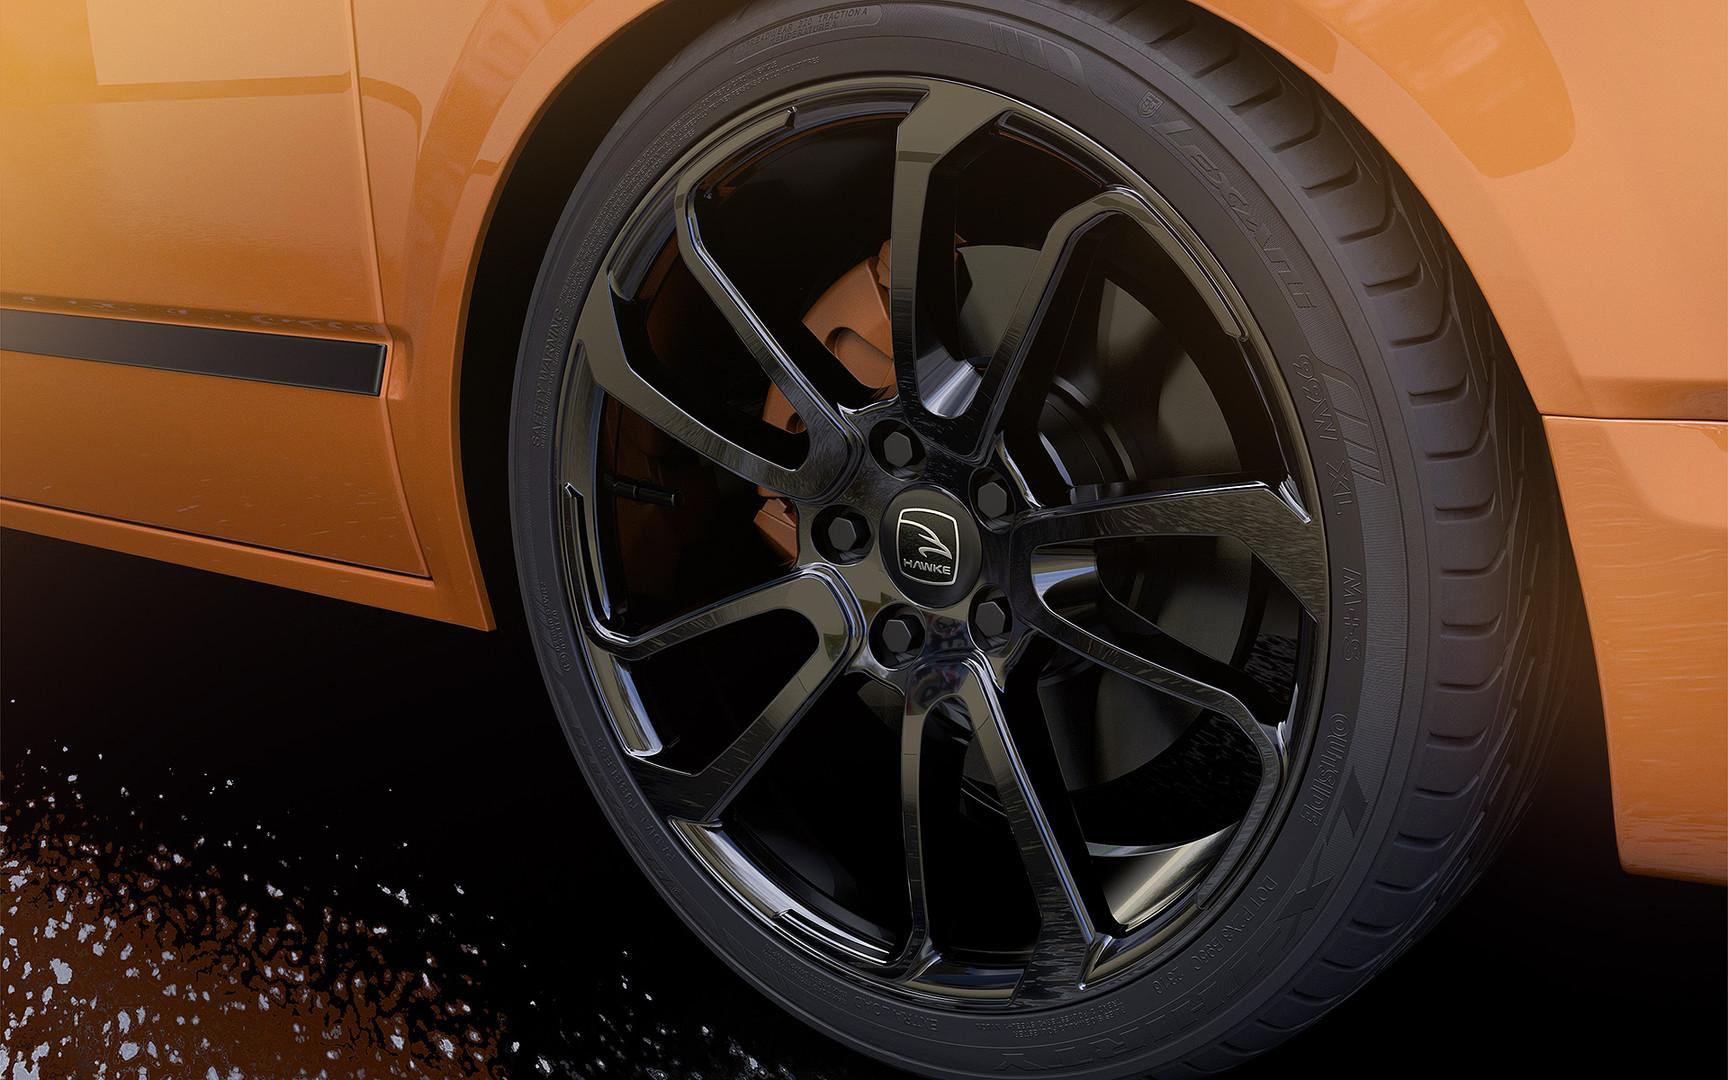 Orange Range Rover Transporter T6 on HAWKE Falkon wheels in Black colour finish